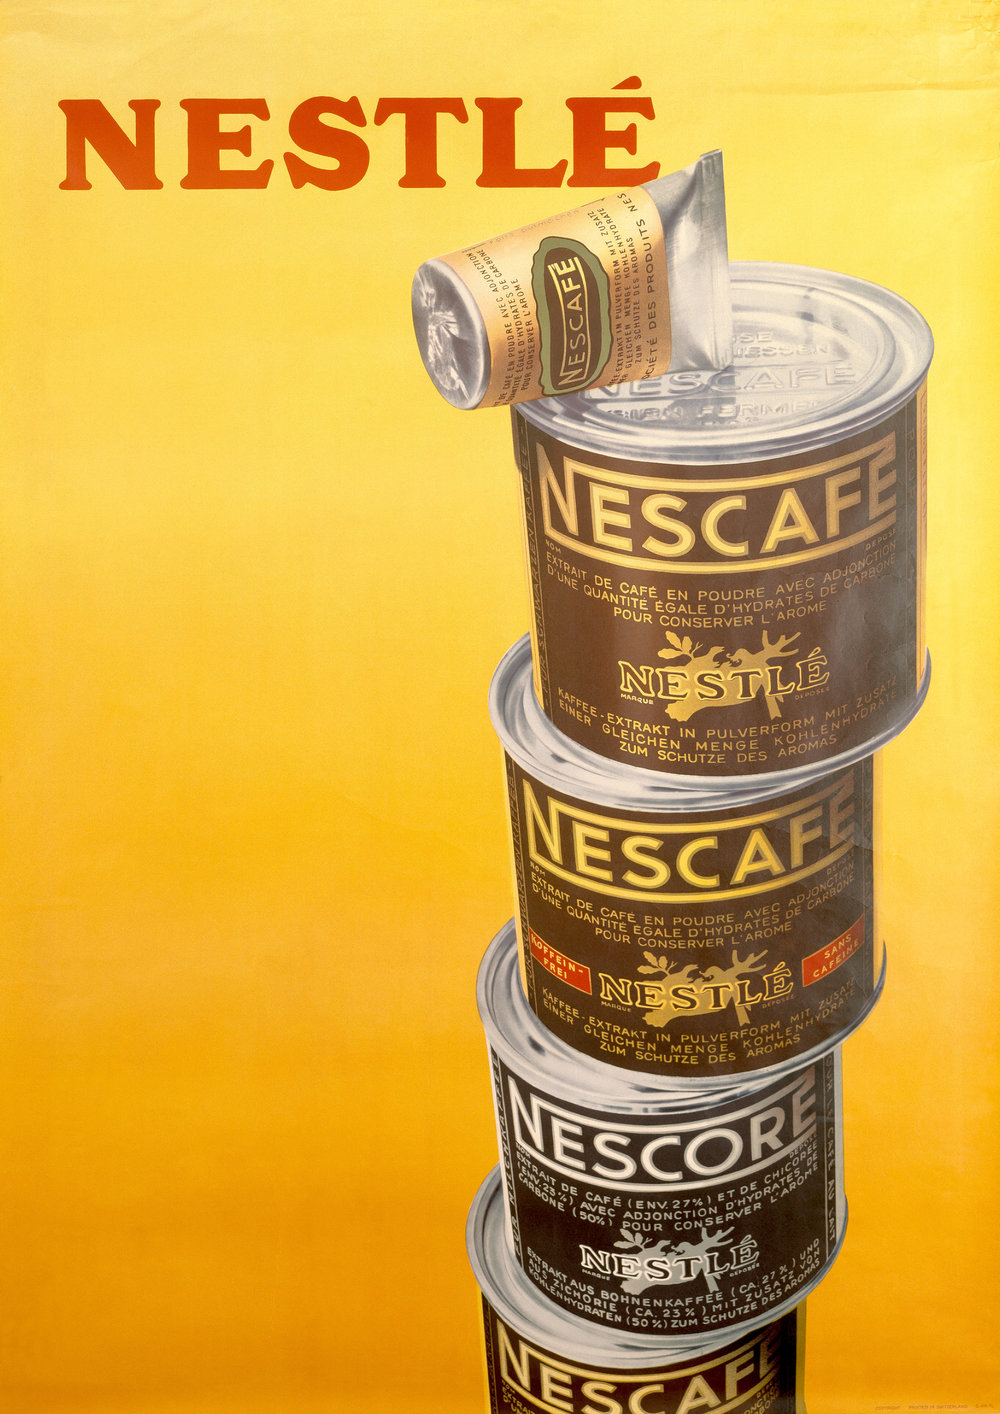 A 1946 advert for Nestlé Nescafe